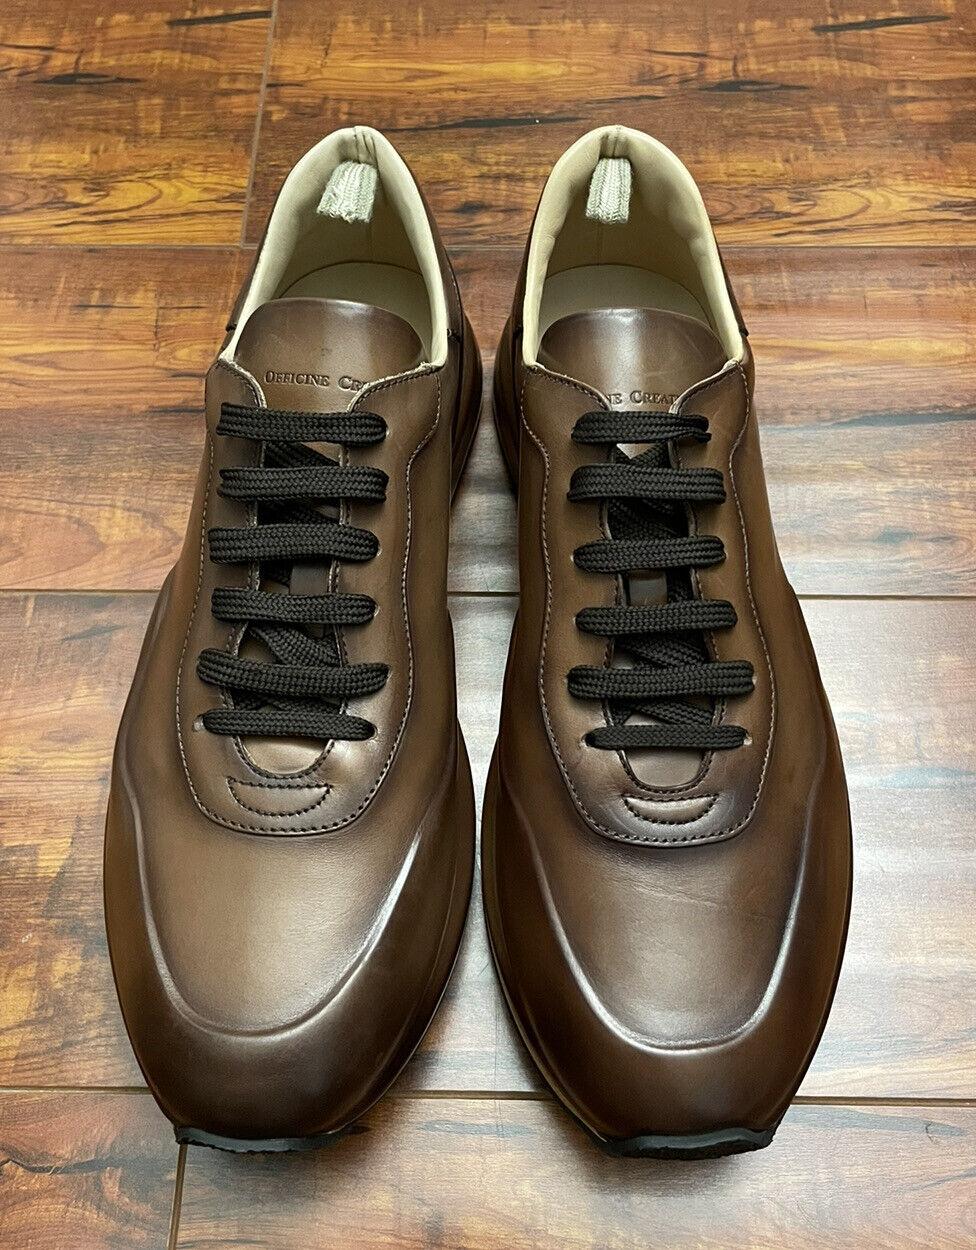 NIB Officine Creative Race Lux Leather Sneakers   Brown, EU 43